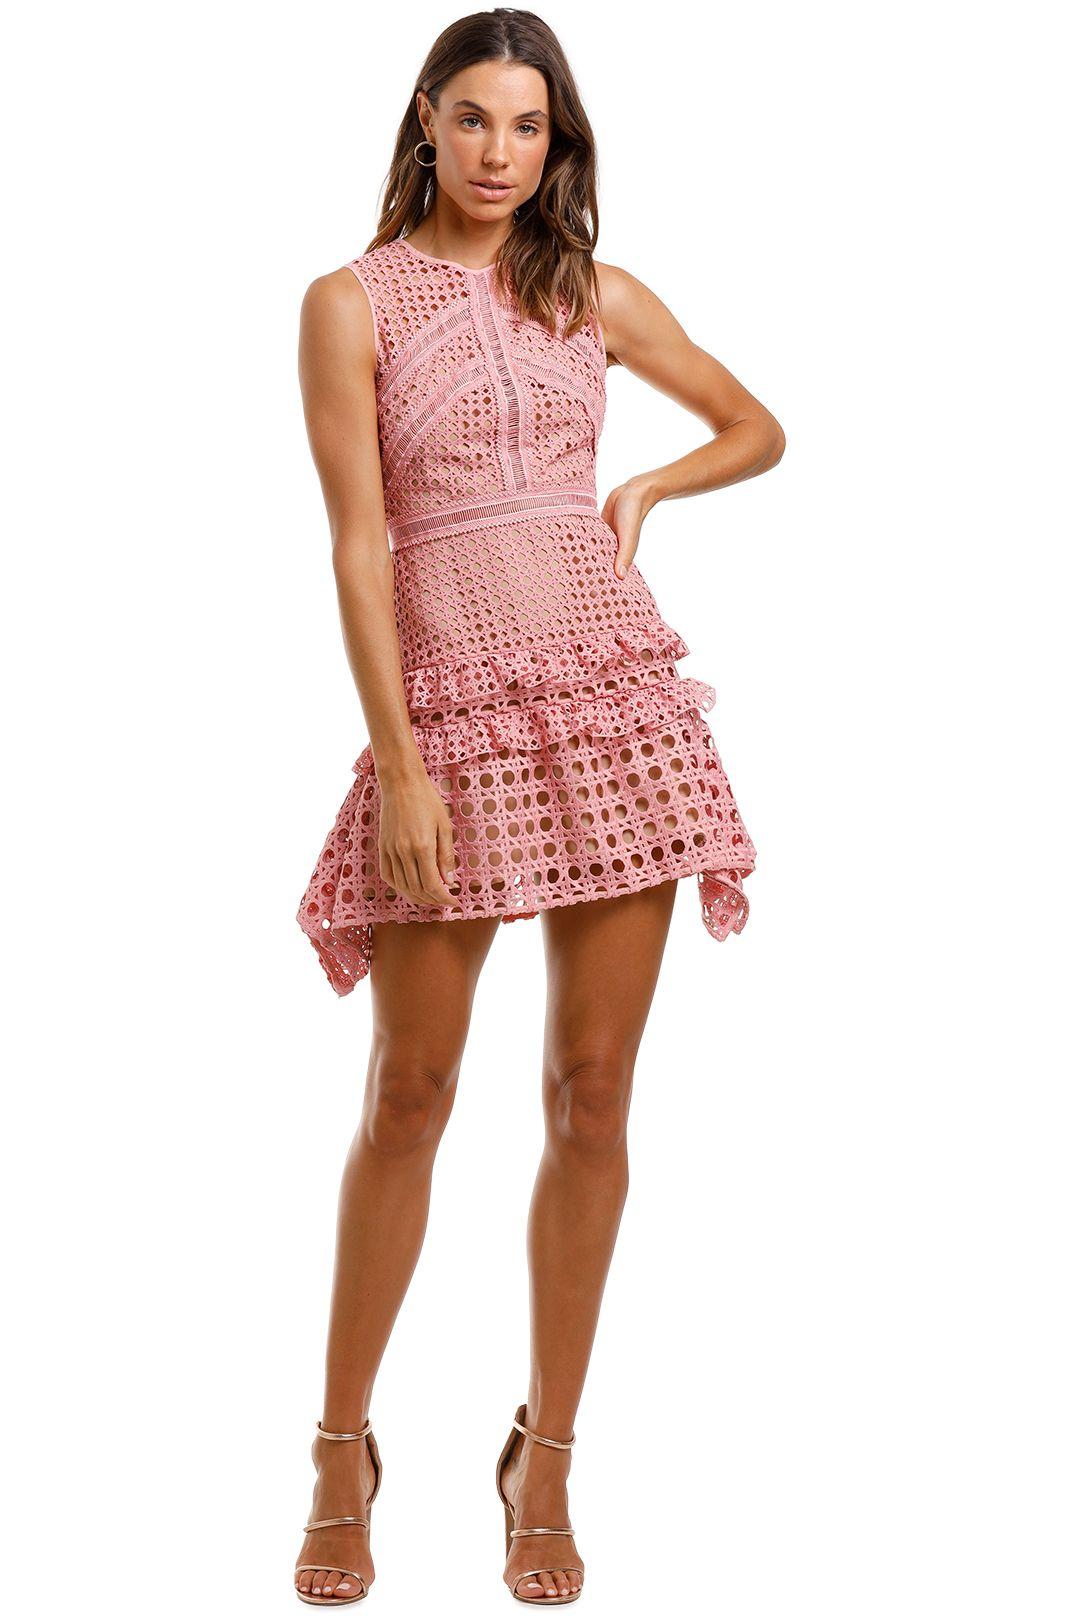 Self Portrait Crosshatch Frill Mini Dress Pink Sleeveless